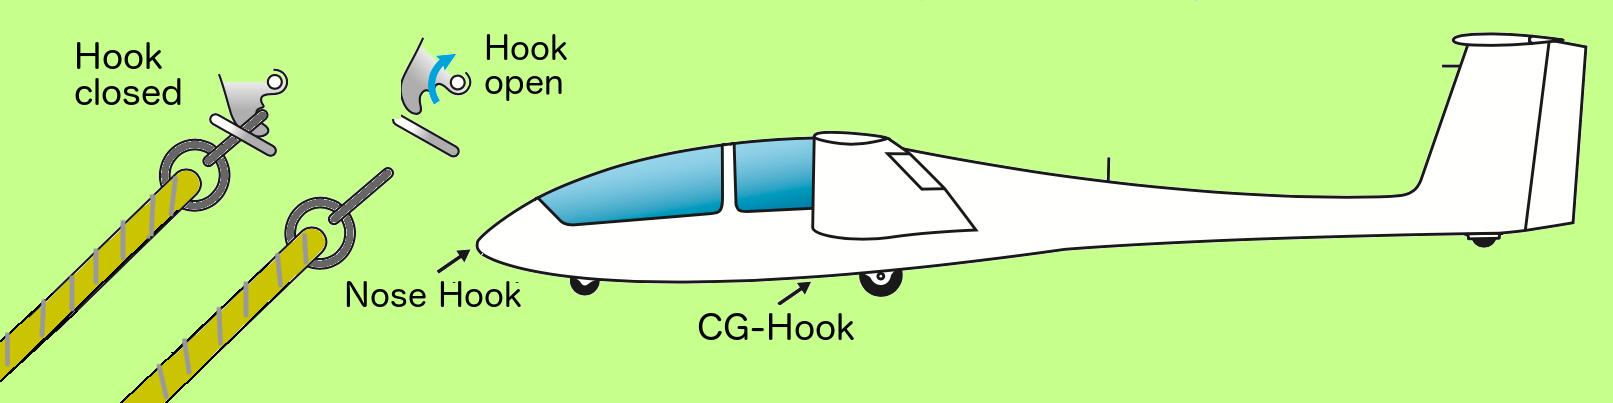 nosehook